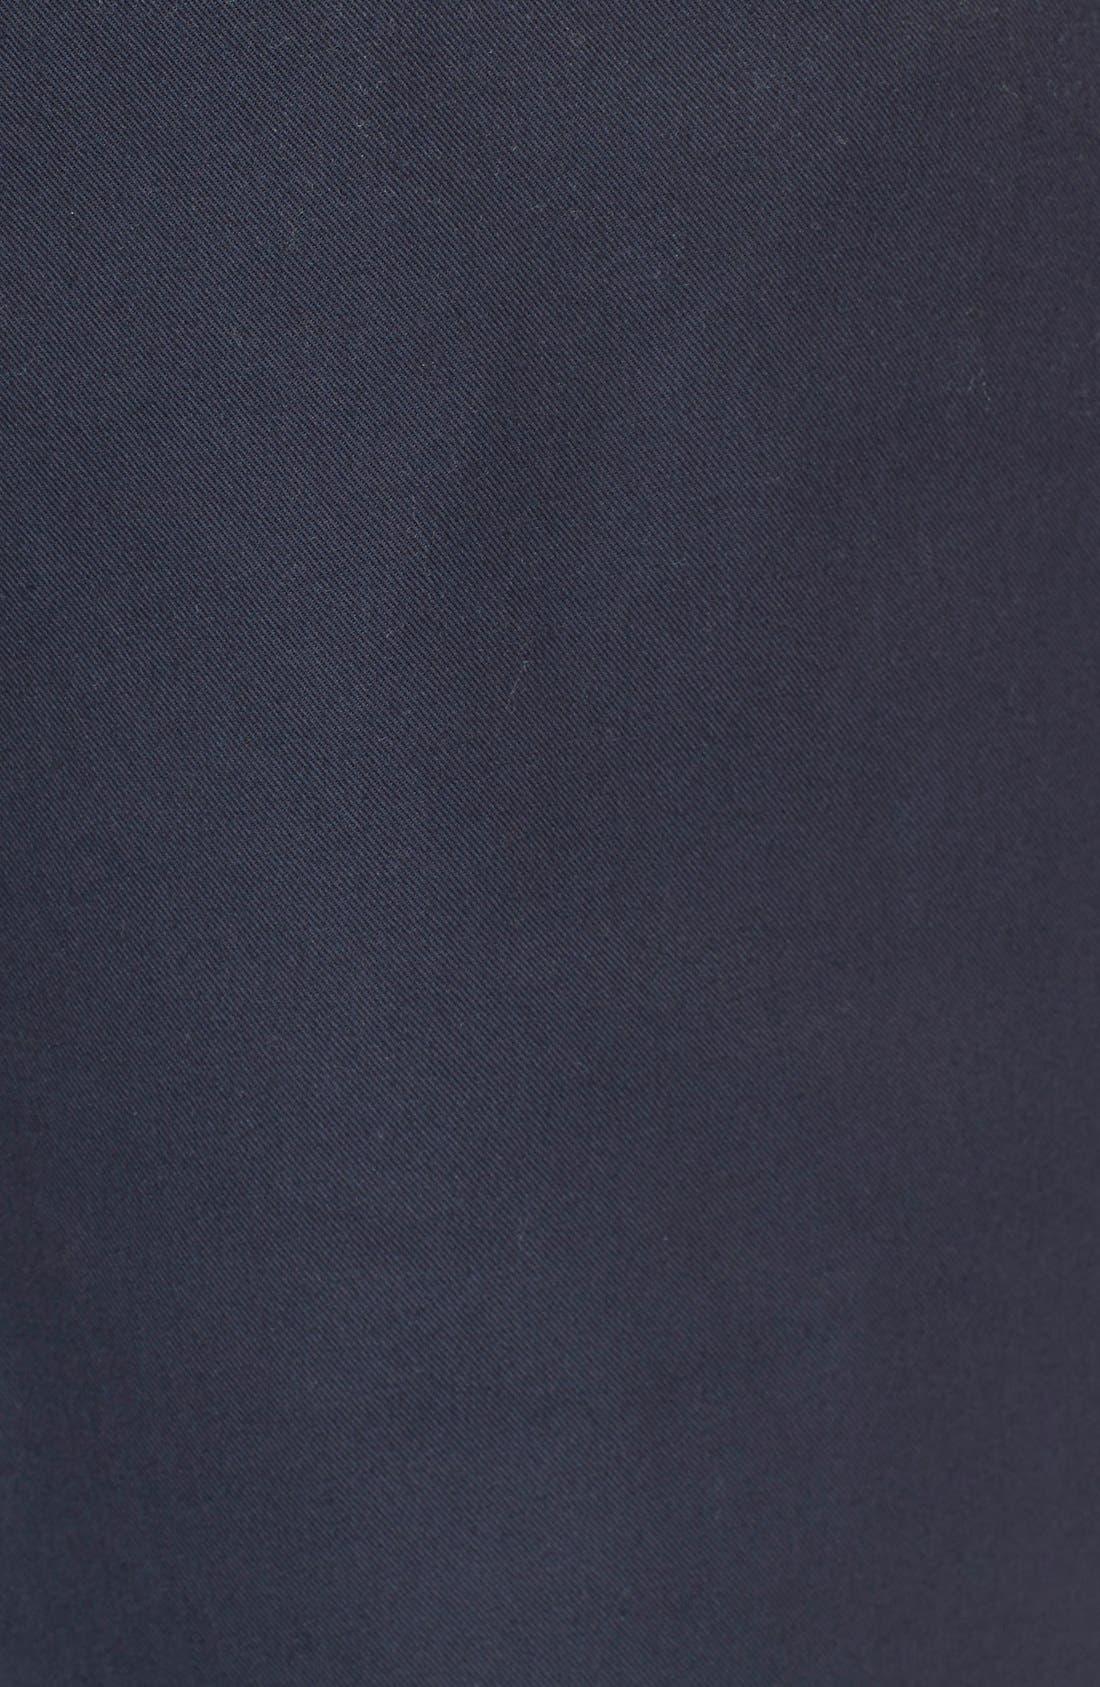 Chino Pants,                             Alternate thumbnail 4, color,                             415